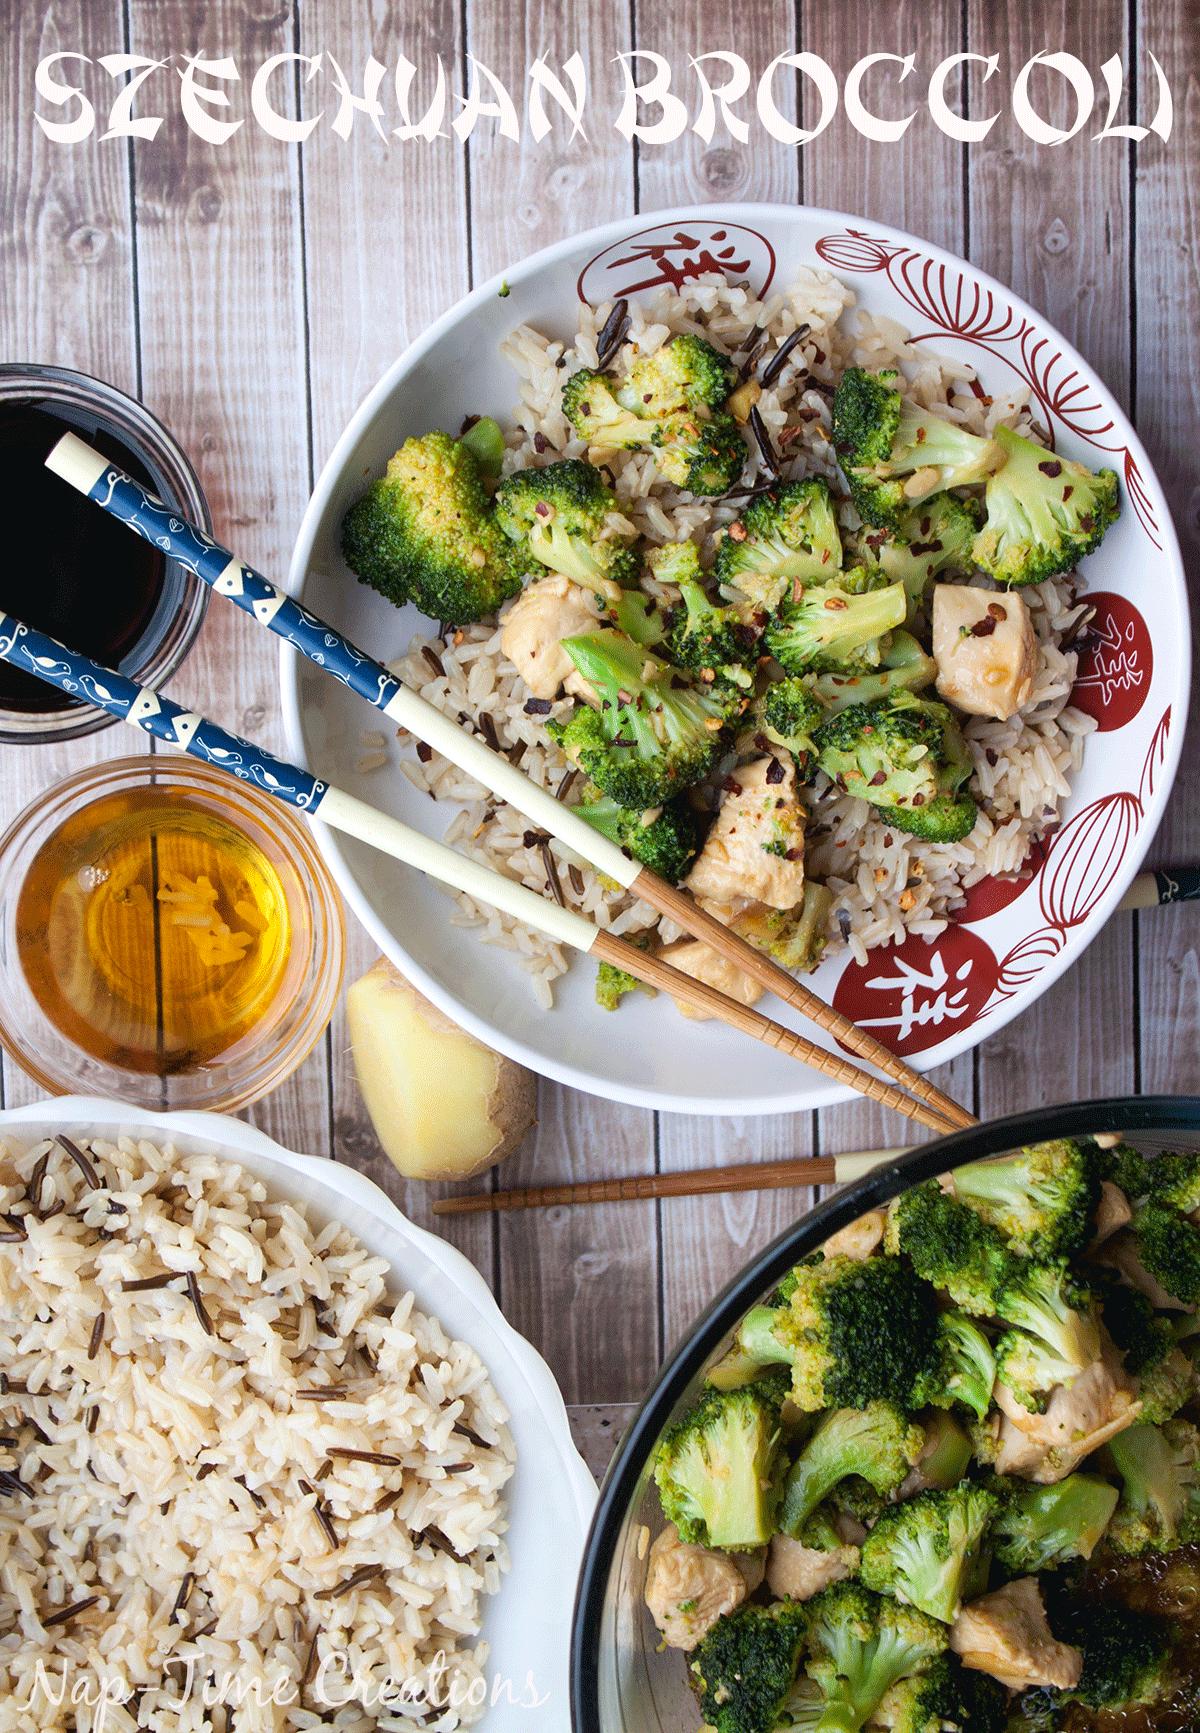 szechuan broccoli recipe from-Nap-Time-Creations